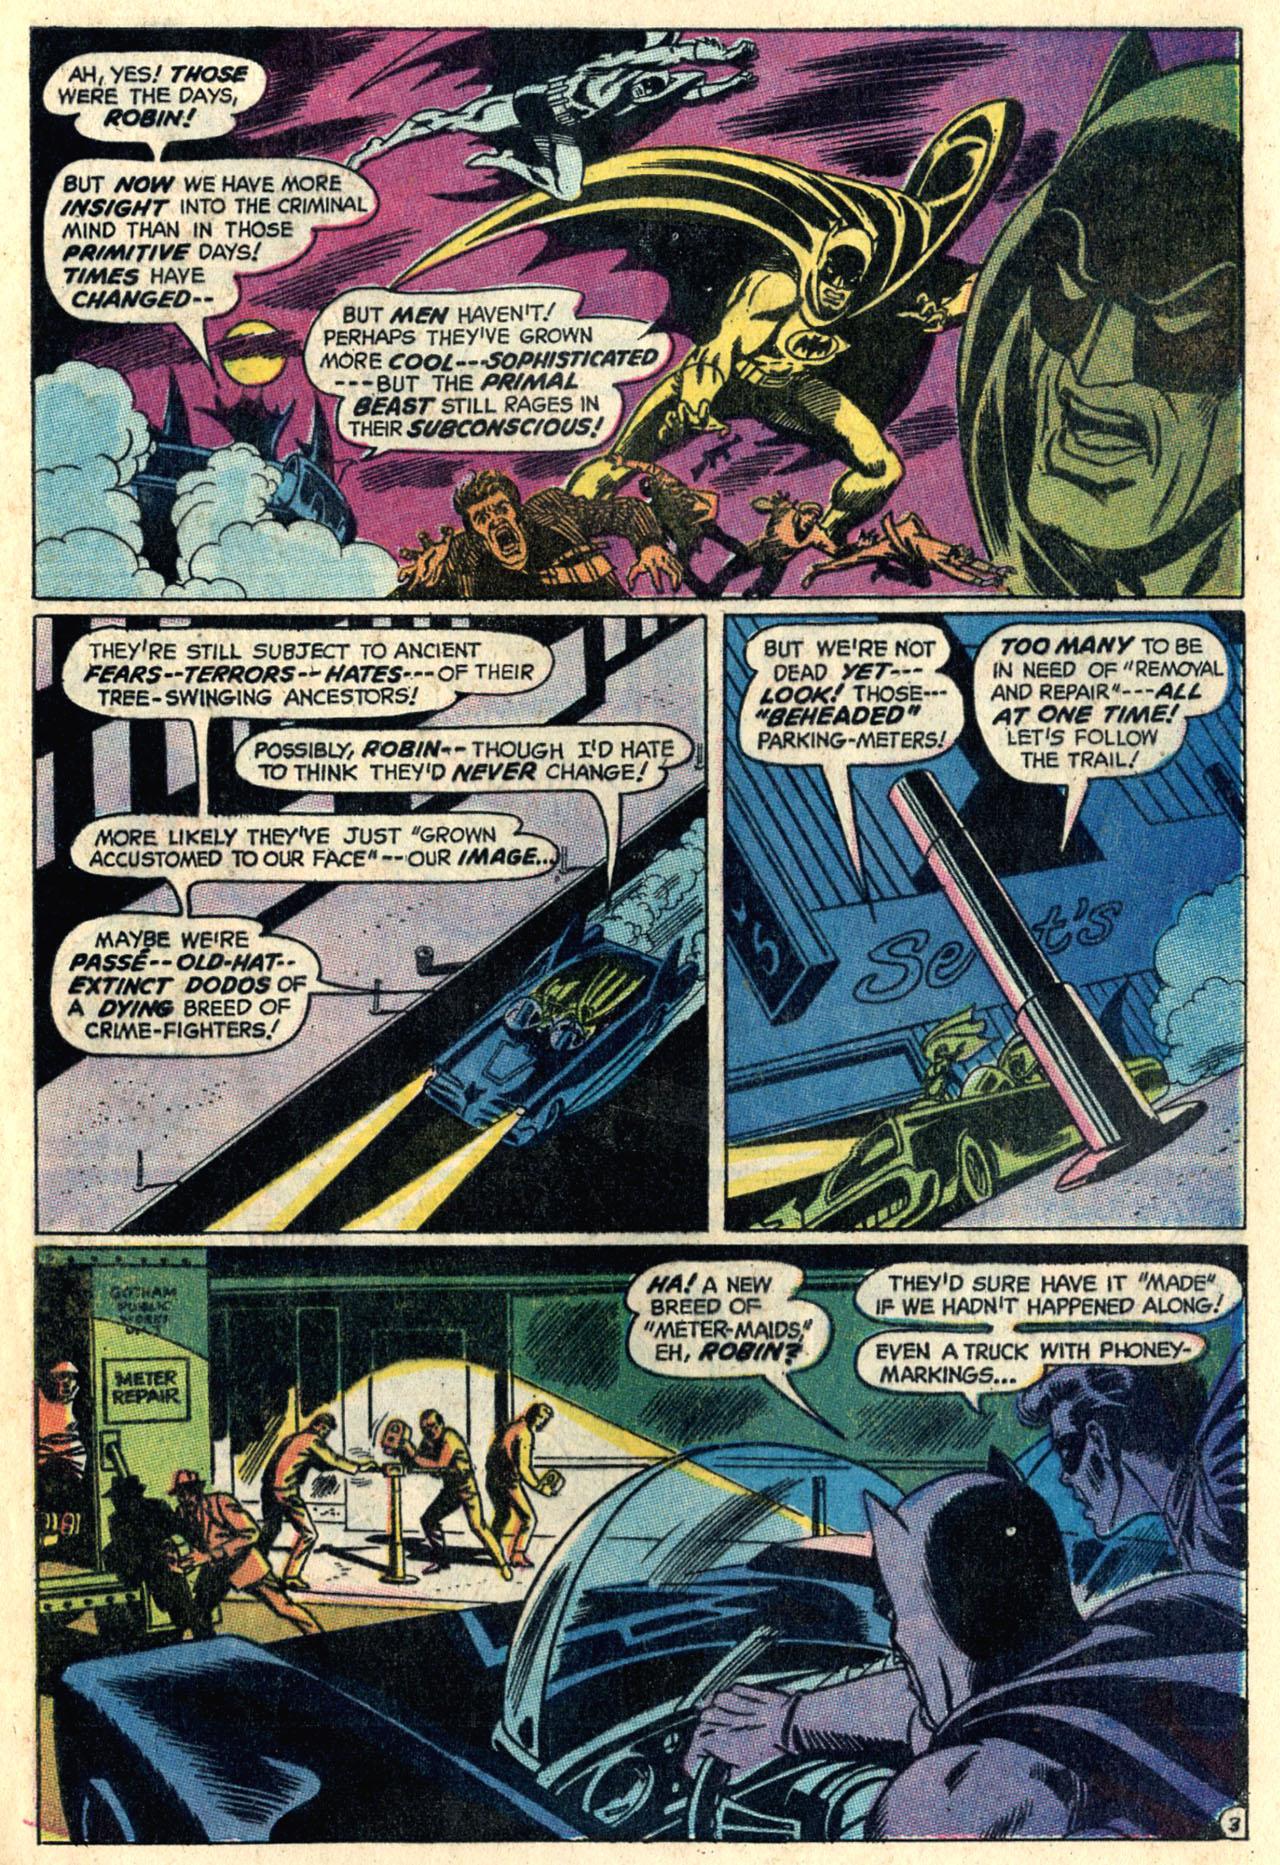 Detective Comics (1937) 389 Page 4